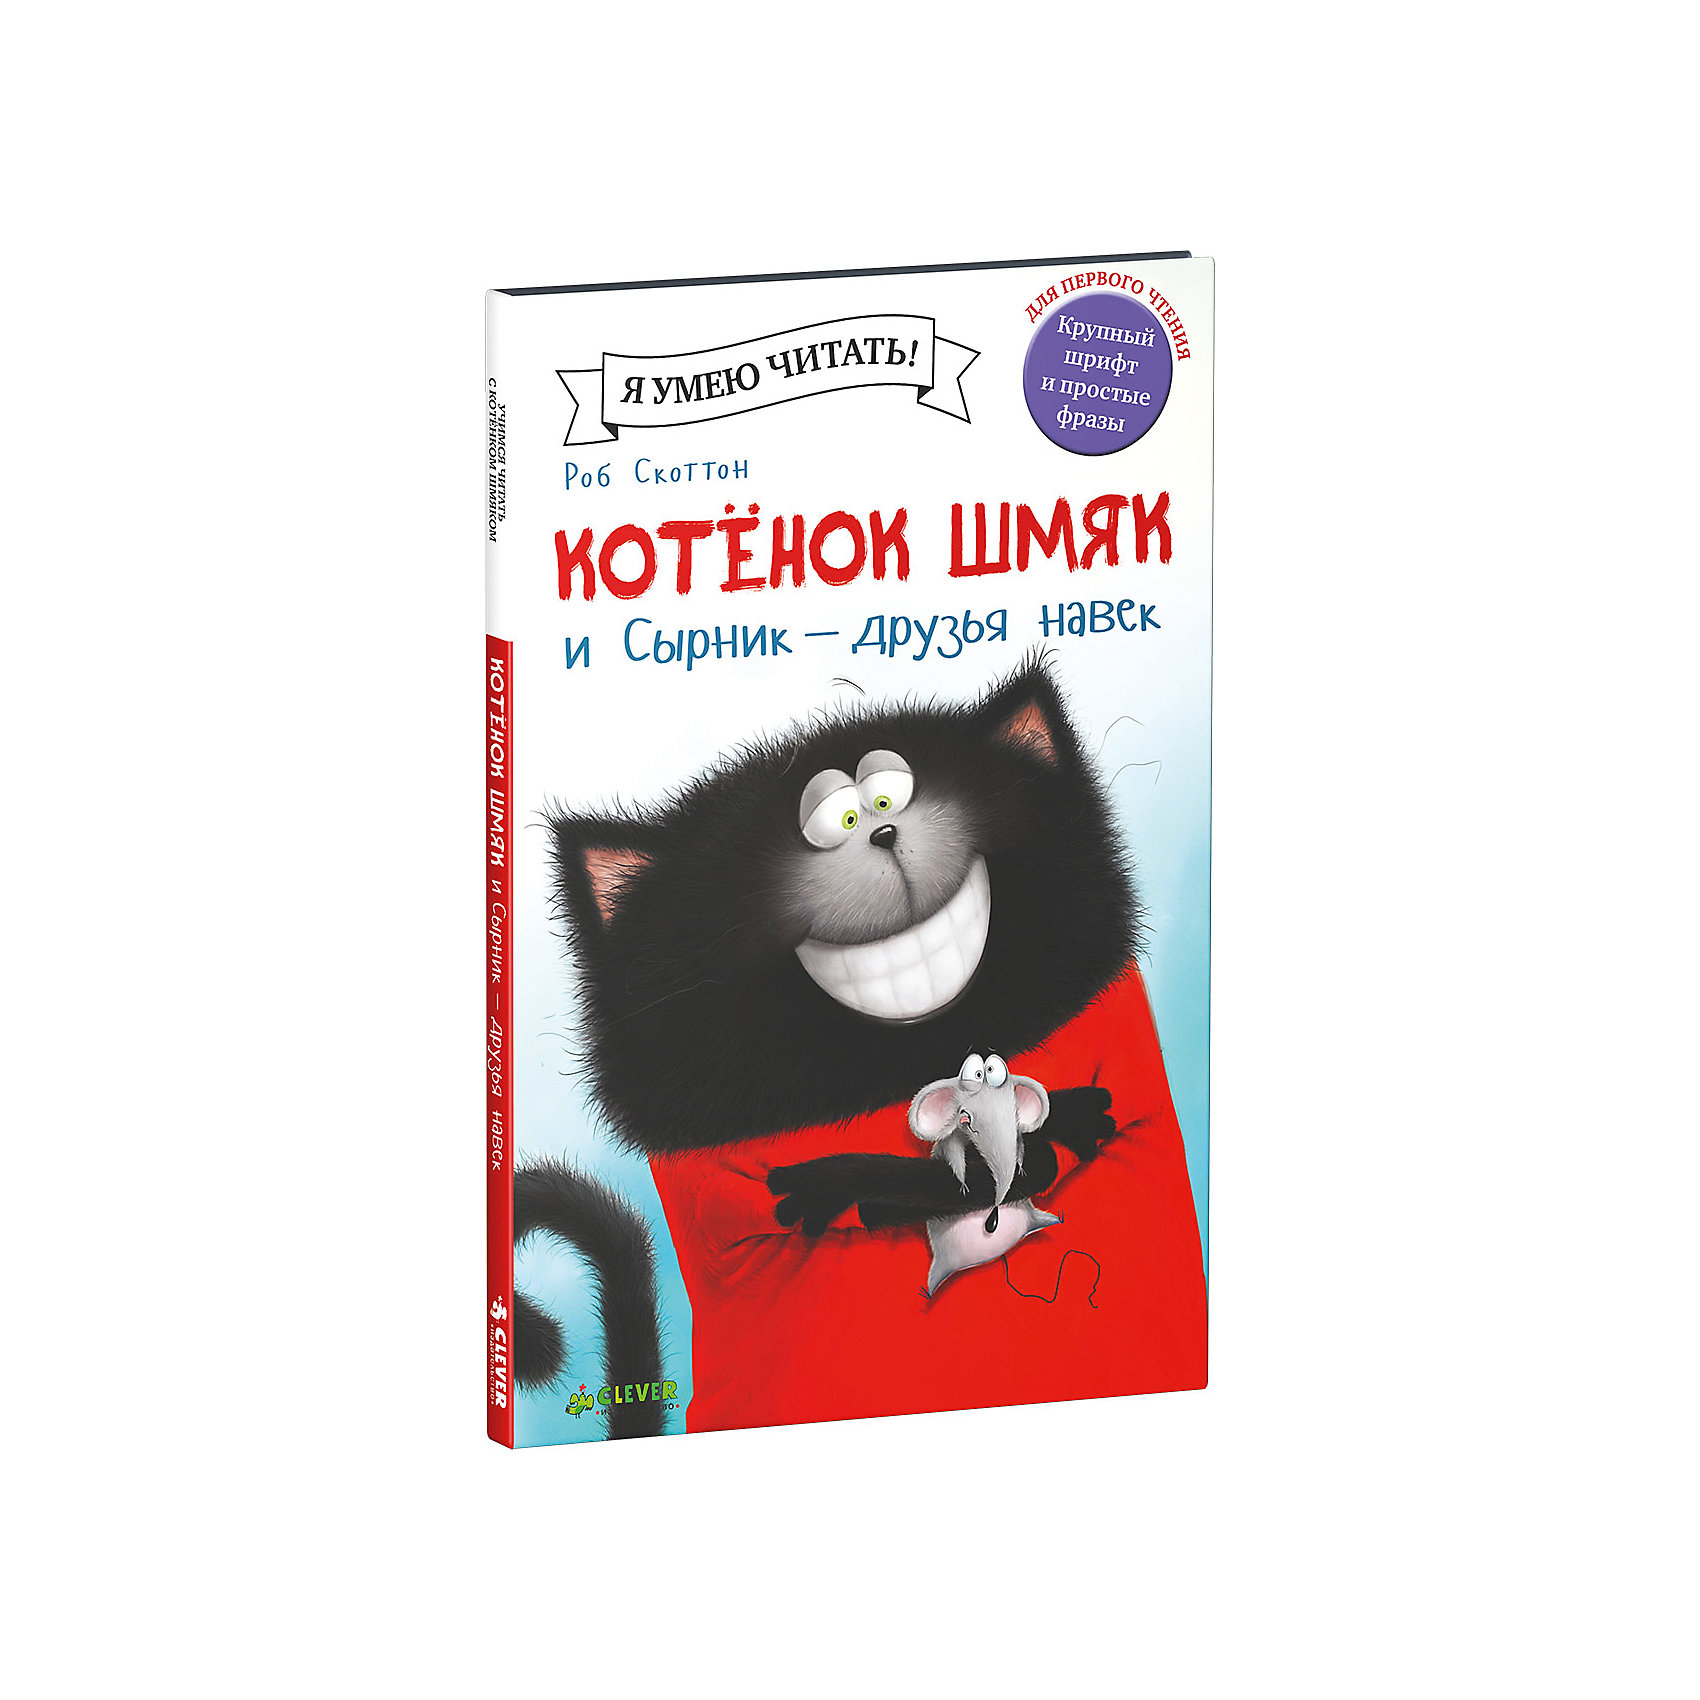 Clever Котёнок Шмяк и Сырник - друзья навек, Роб Скоттон цена и фото